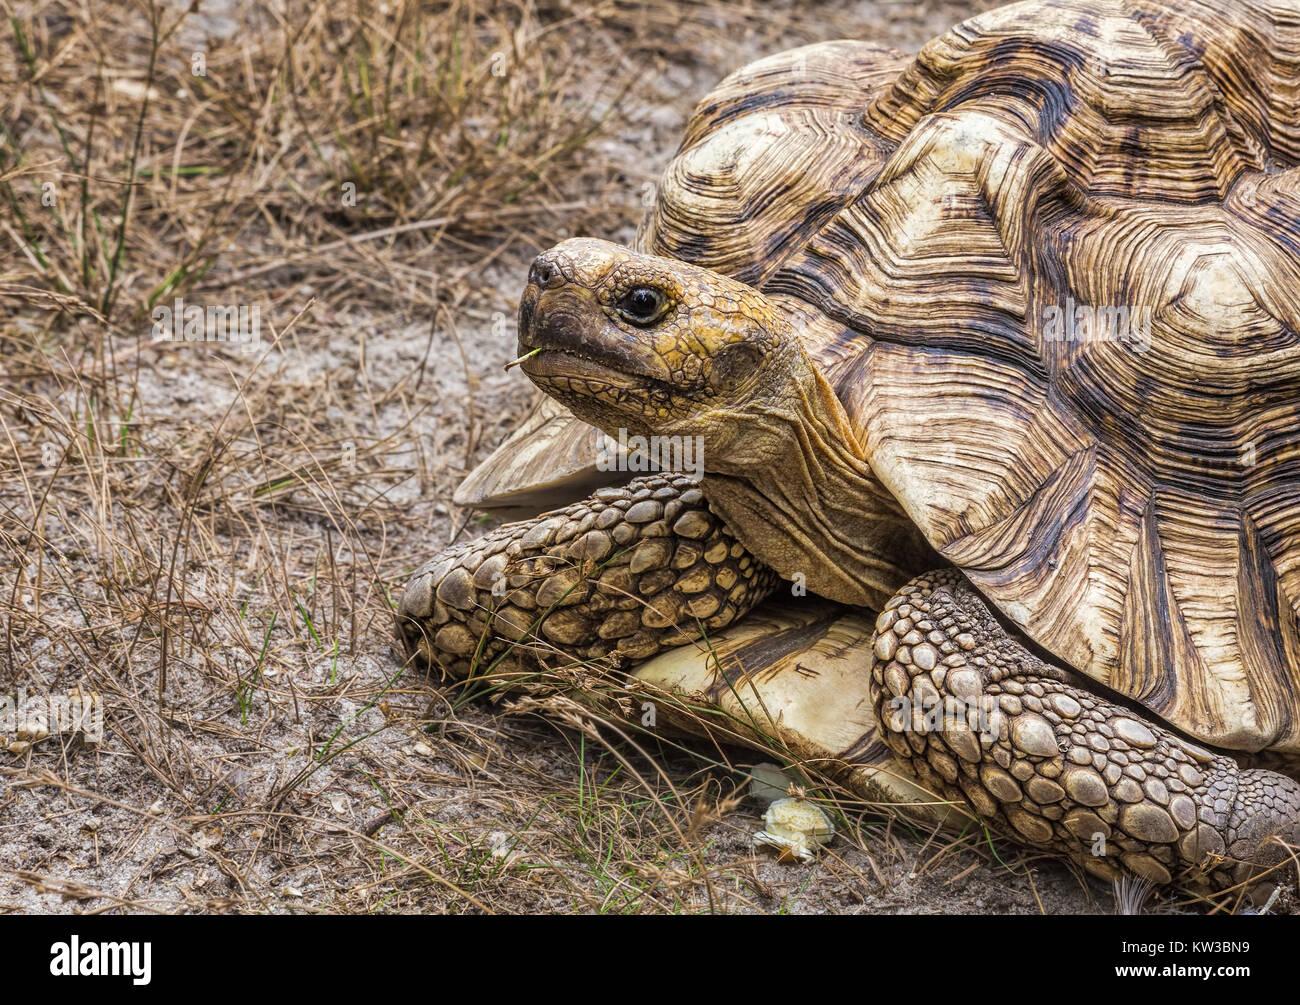 An Aldabra giant tortoise (Aldabrachelys Gigantea) - Stock Image